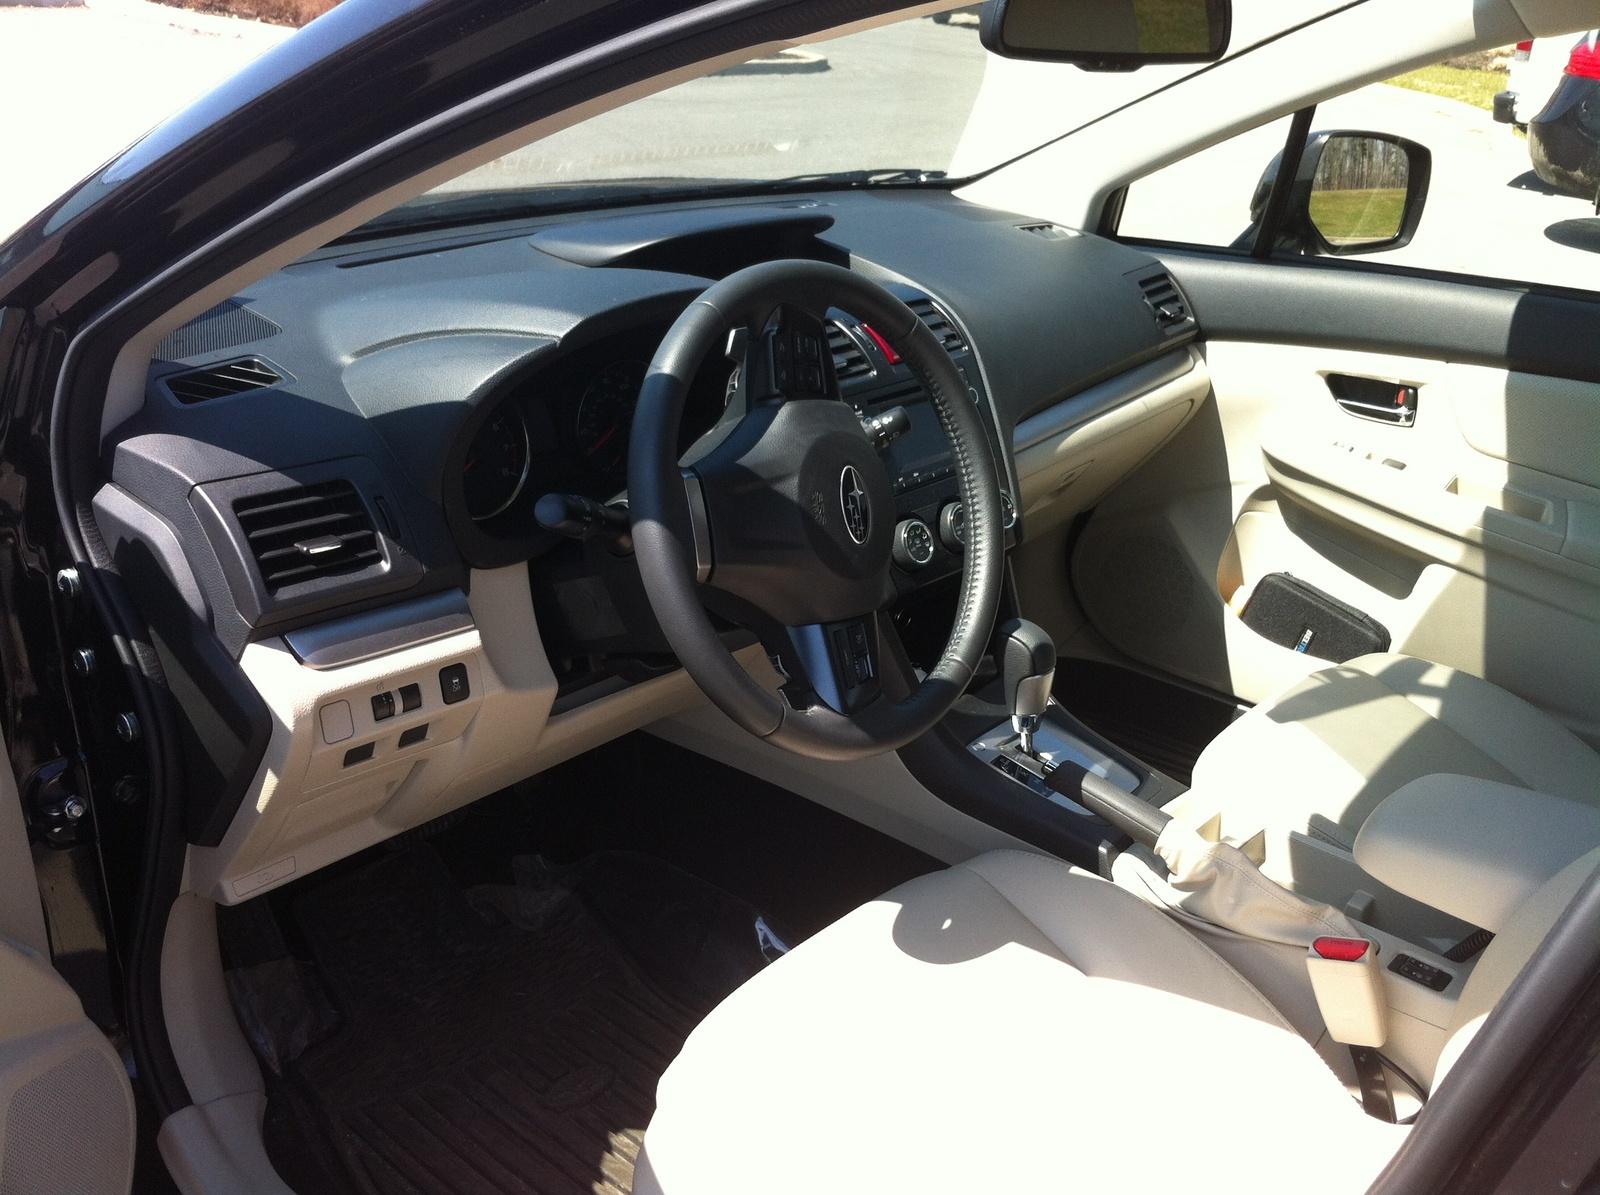 2013 Subaru Xv Crosstrek Pictures Cargurus